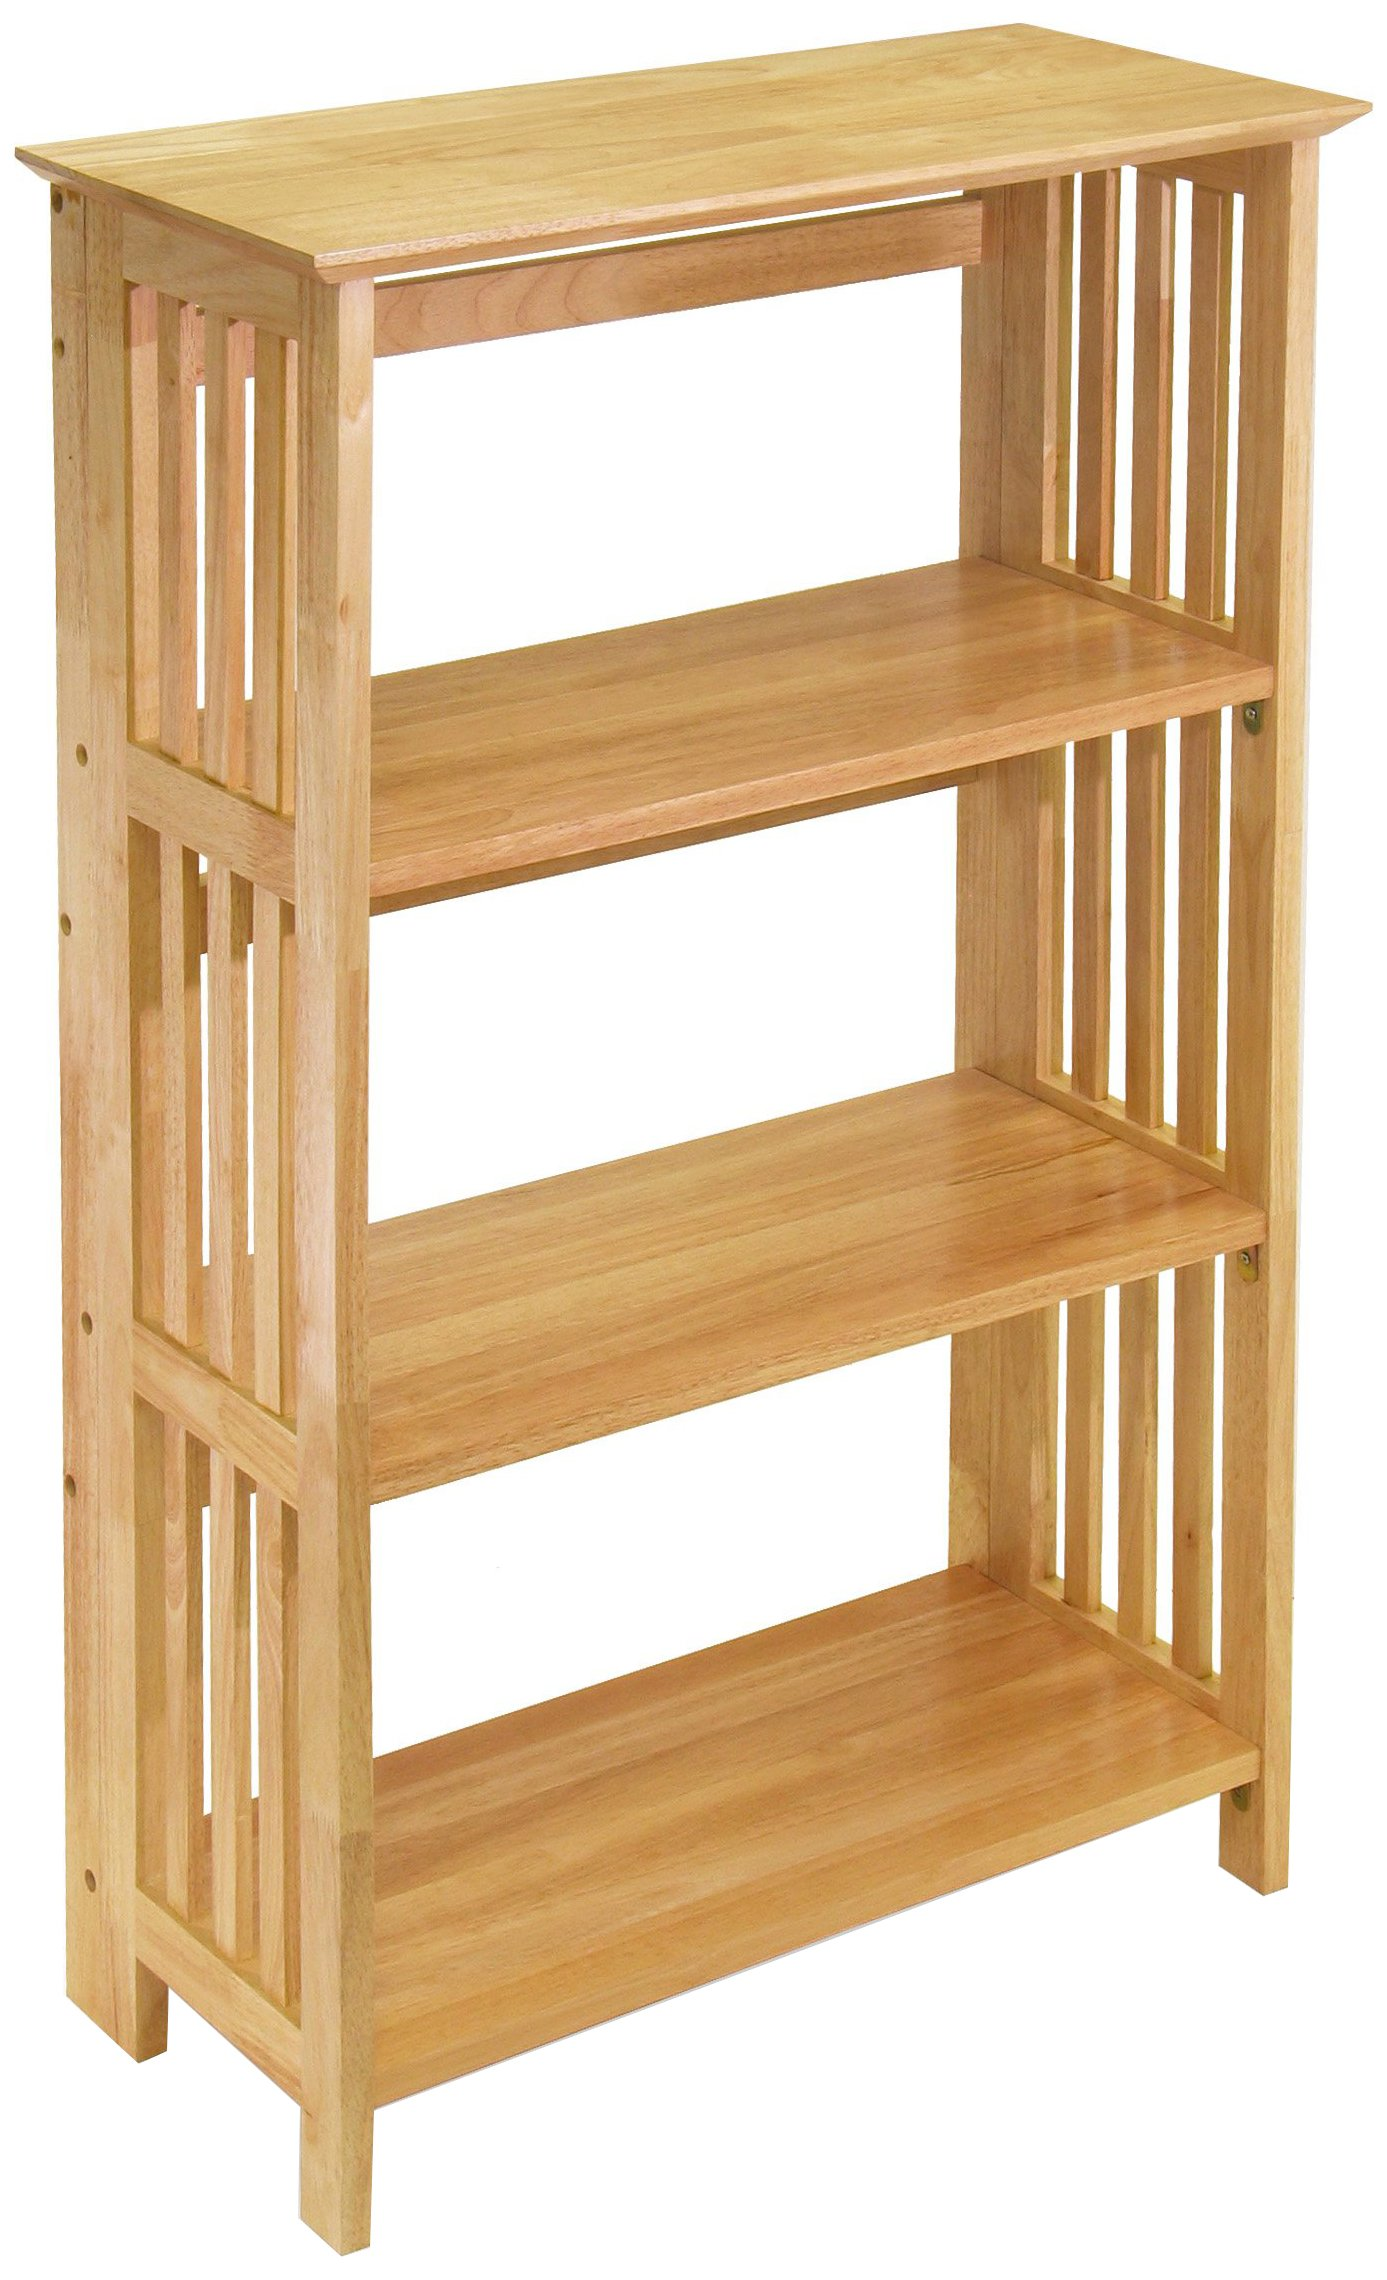 winsome wood foldable 4 tier shelf natural - Deep Bookshelves